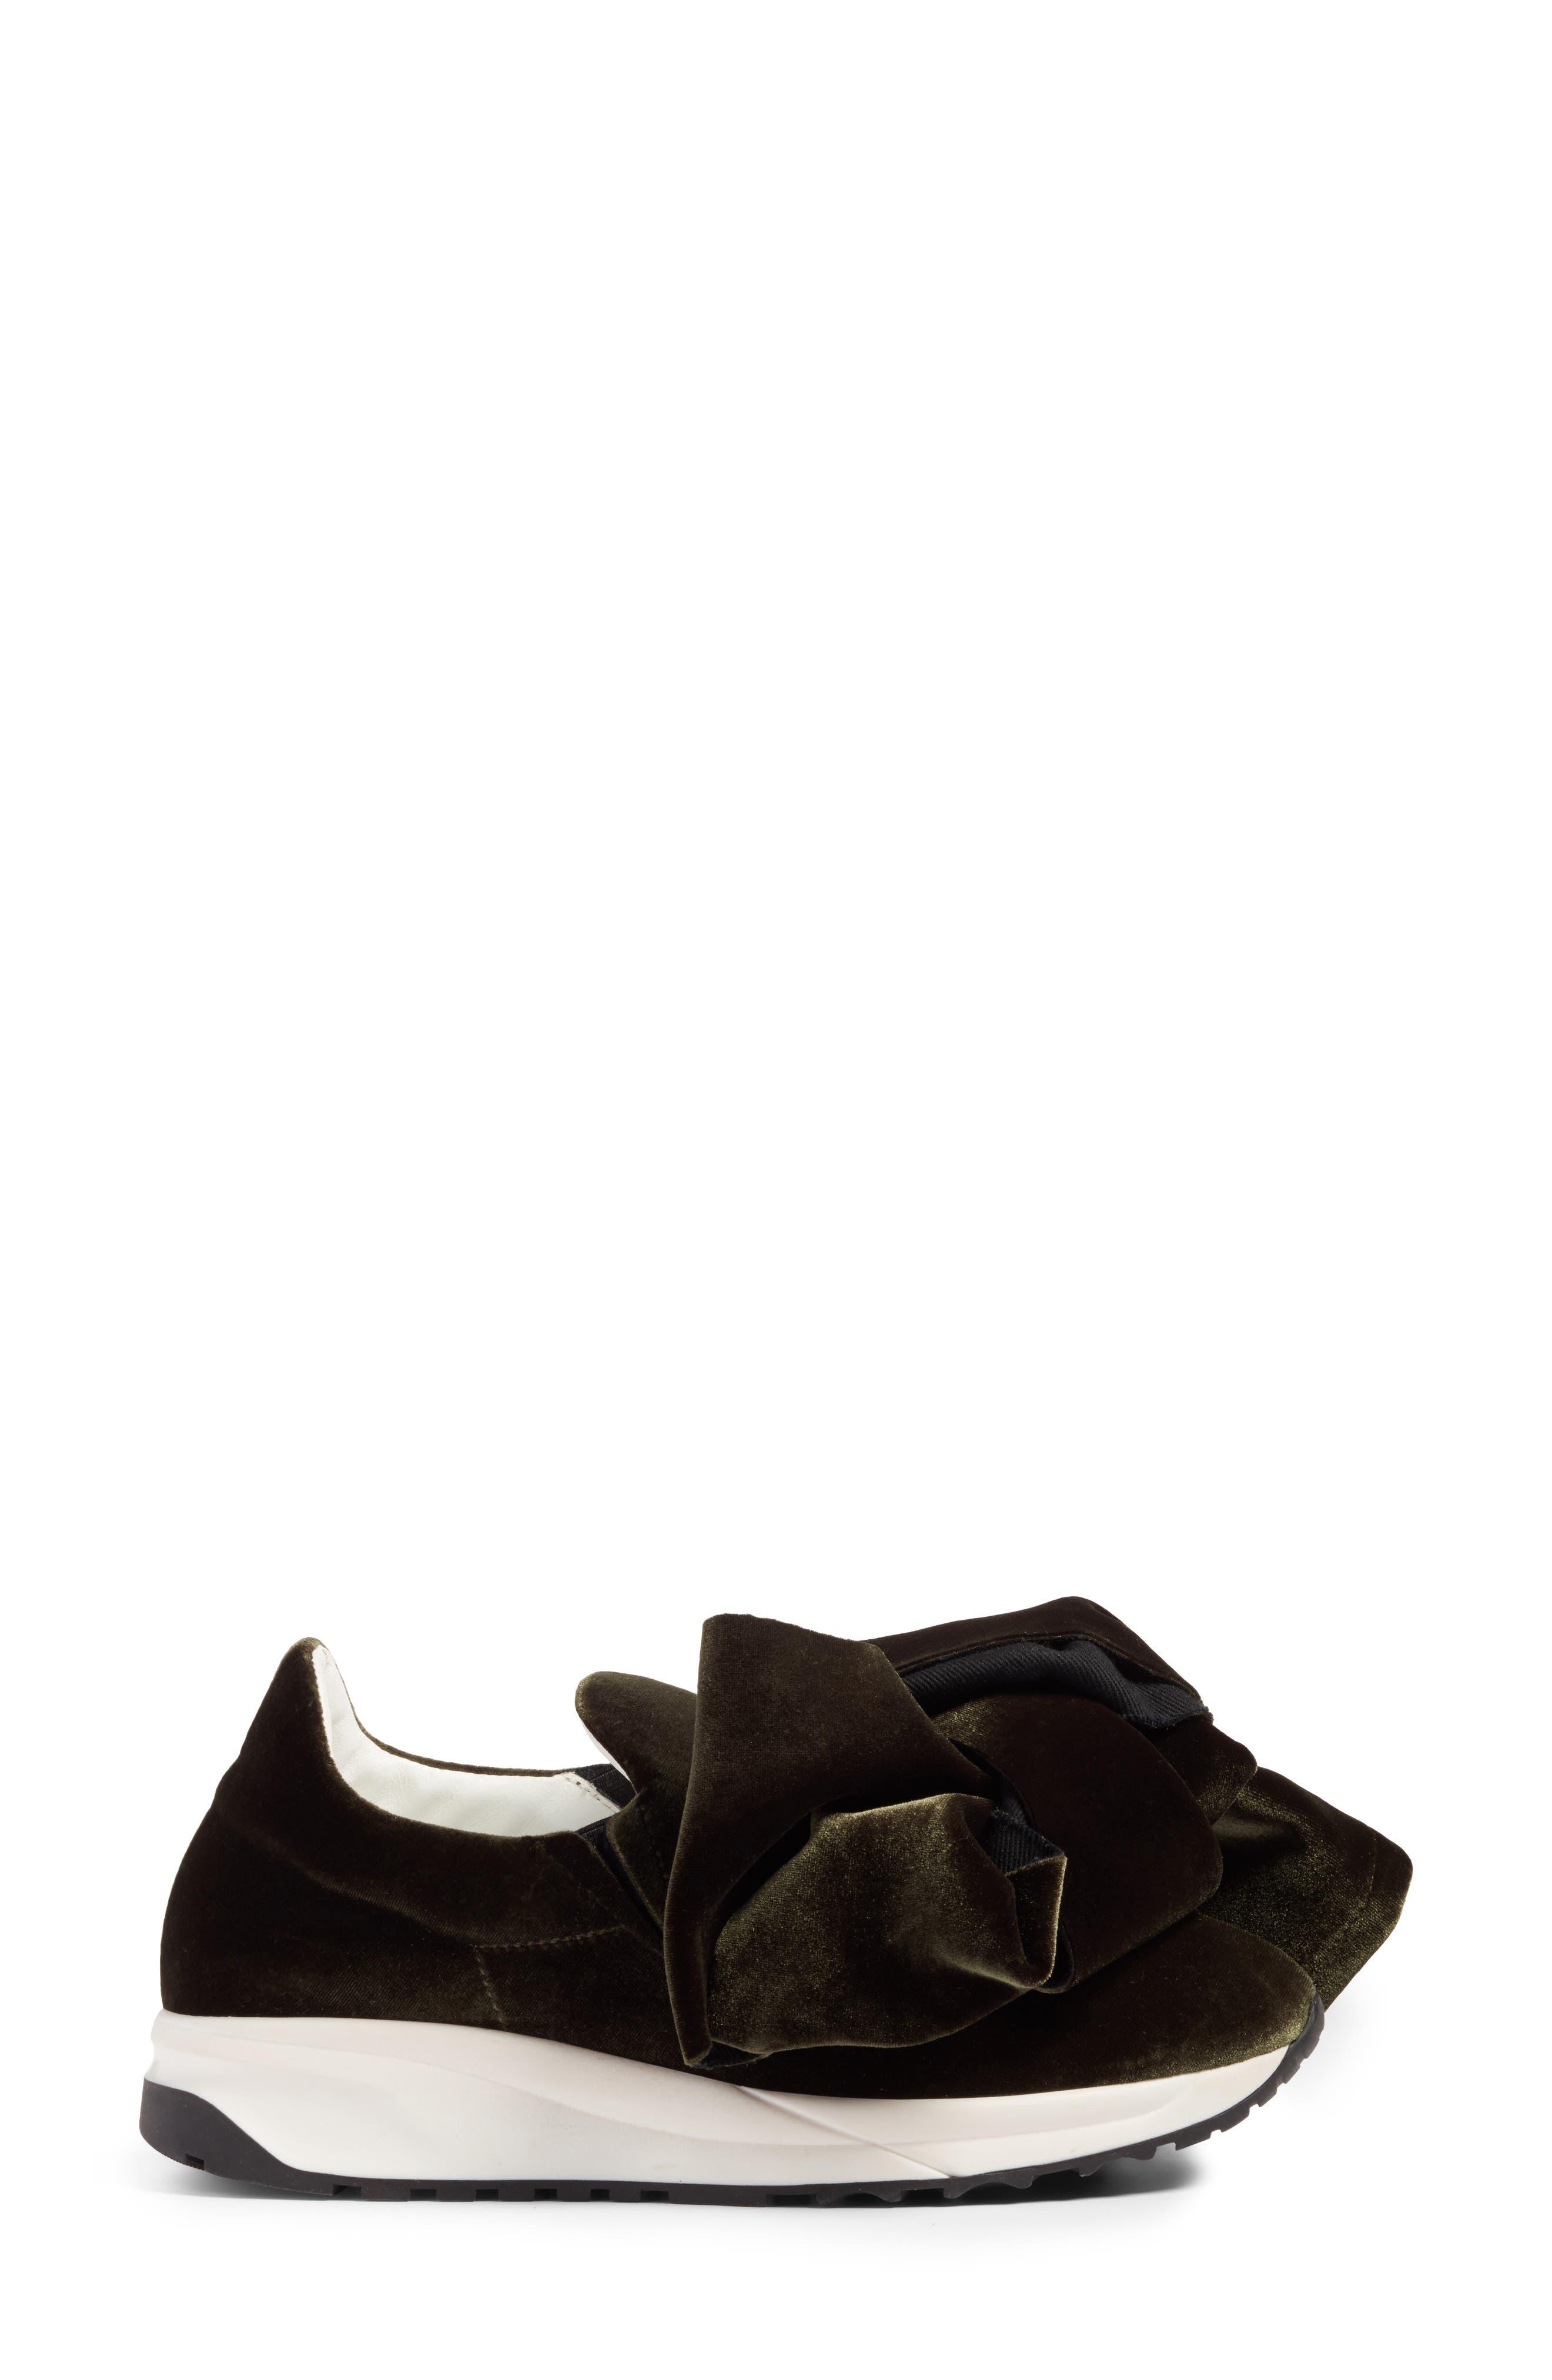 Knotted Slip-On Sneaker,                             Alternate thumbnail 3, color,                             300